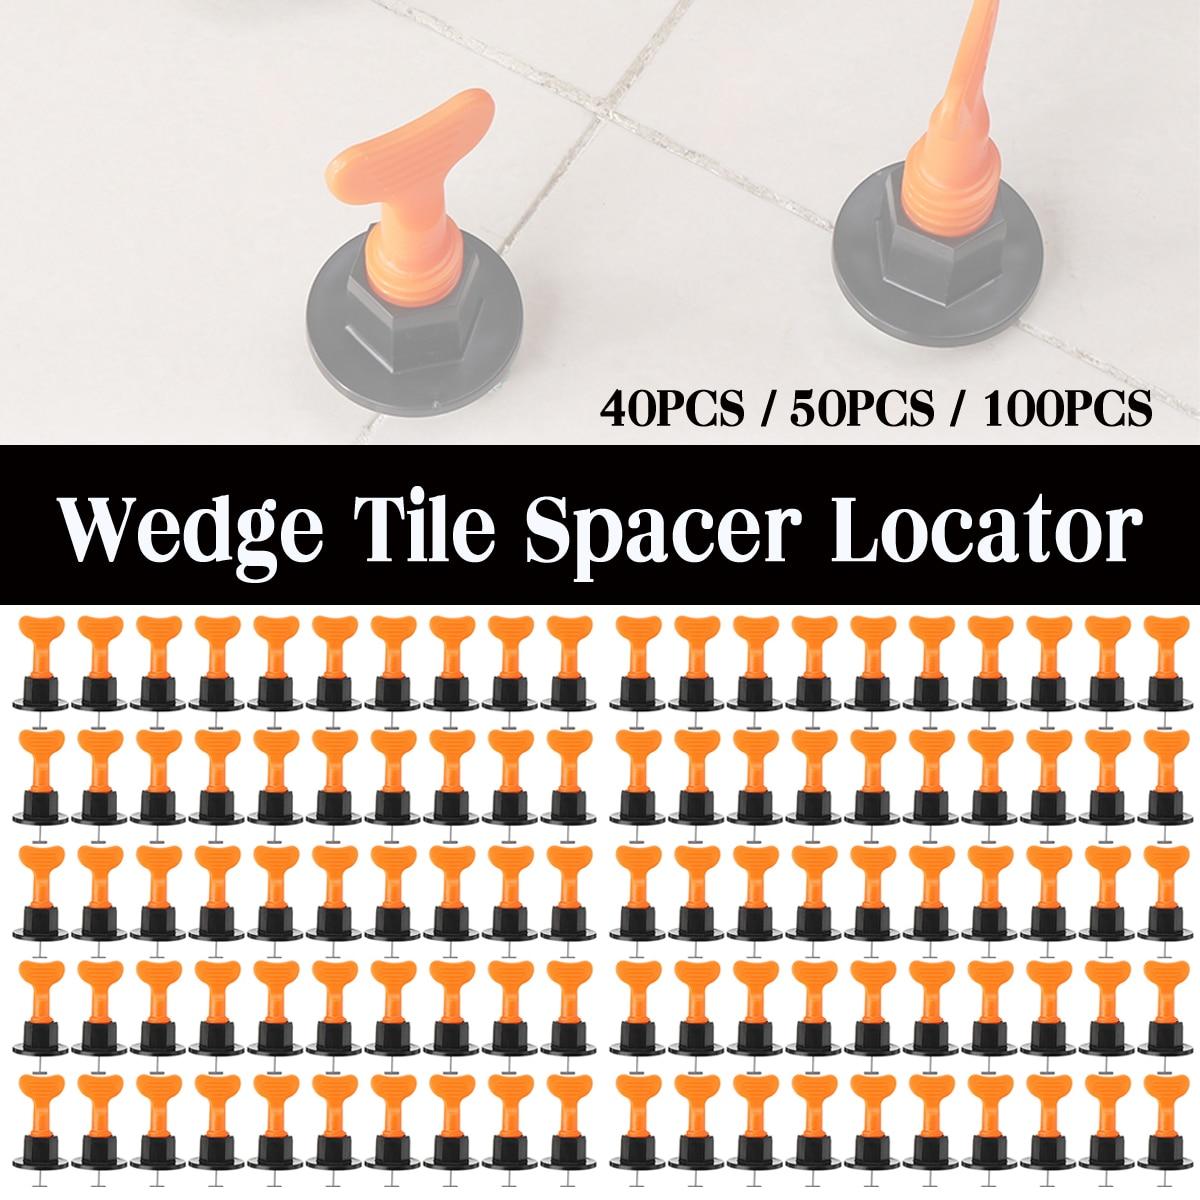 100pcs / set تراز کاشی تسطیح گوه کاشی فاصله کاشی سیستم مسطح سرامیک مسطح برای دیوار ابزار ساخت و ساز کف کف